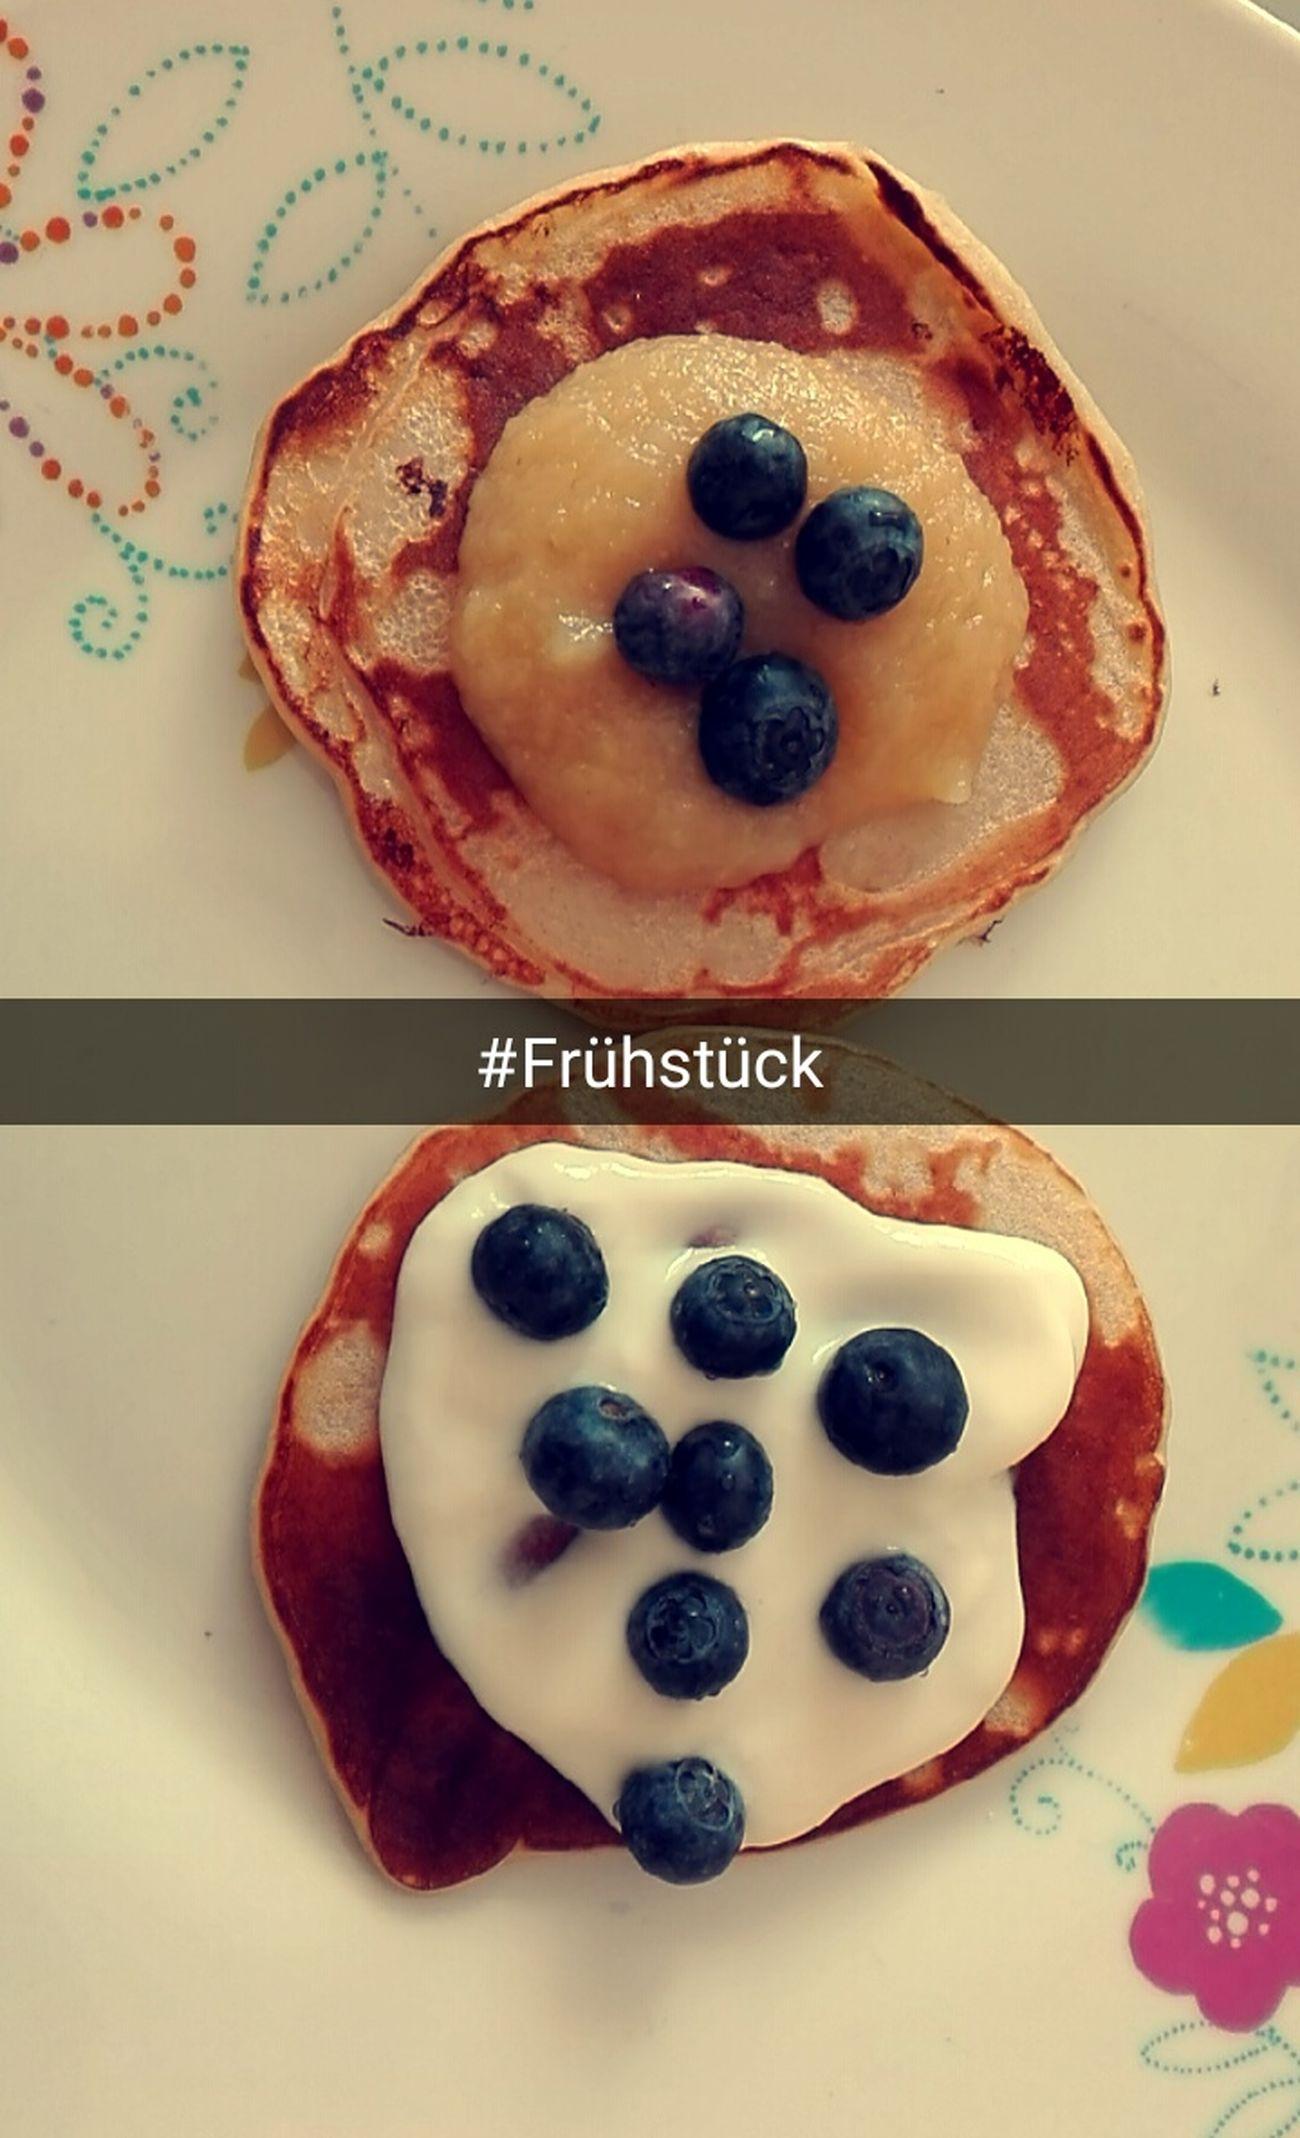 Frühstück Mmmm☺ Pfannkuchen Lecker Nice Hungry Soo Cute Süss